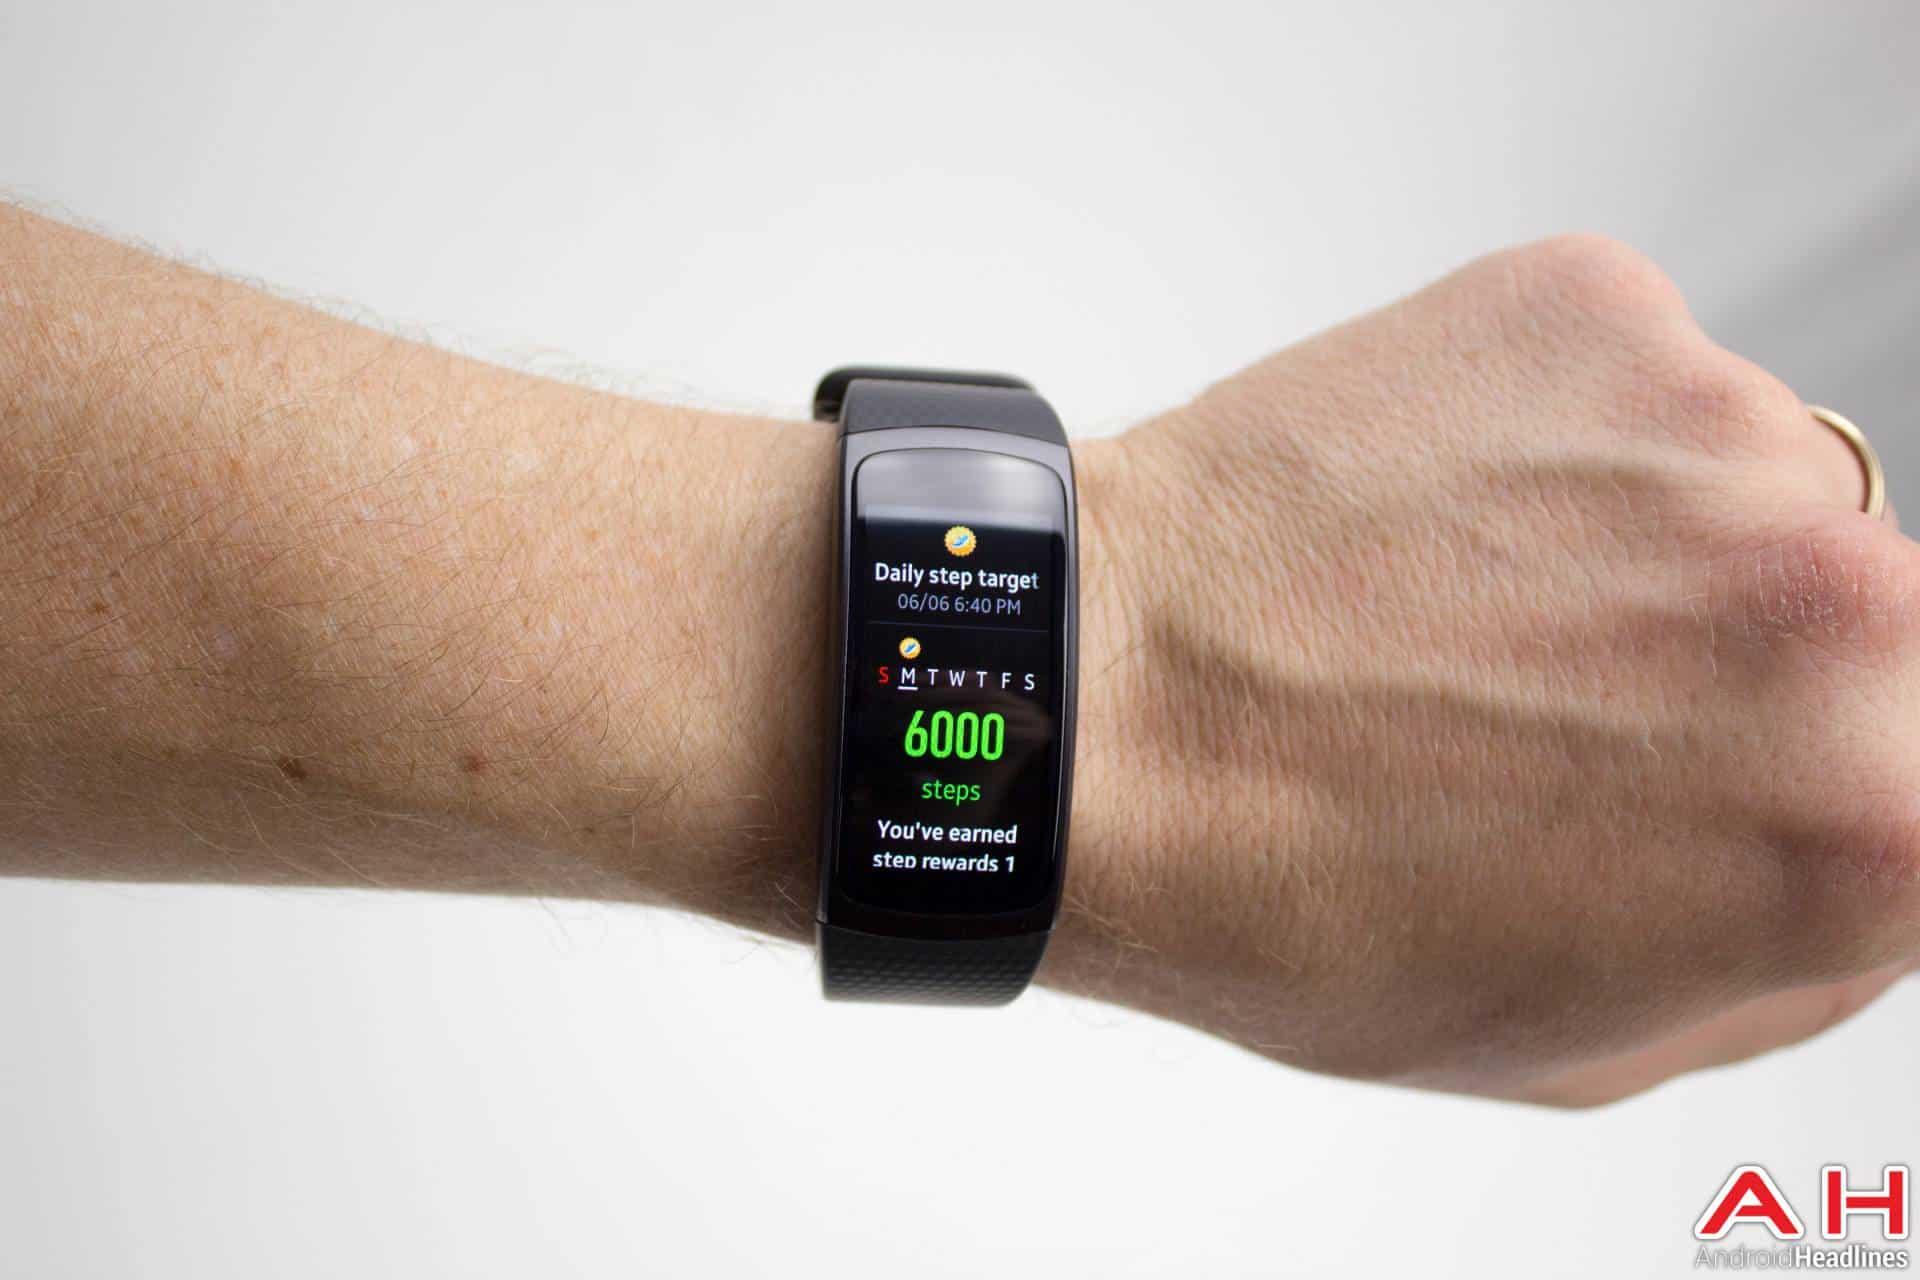 Samsung-Gear-Fit2-AH-NS-steps